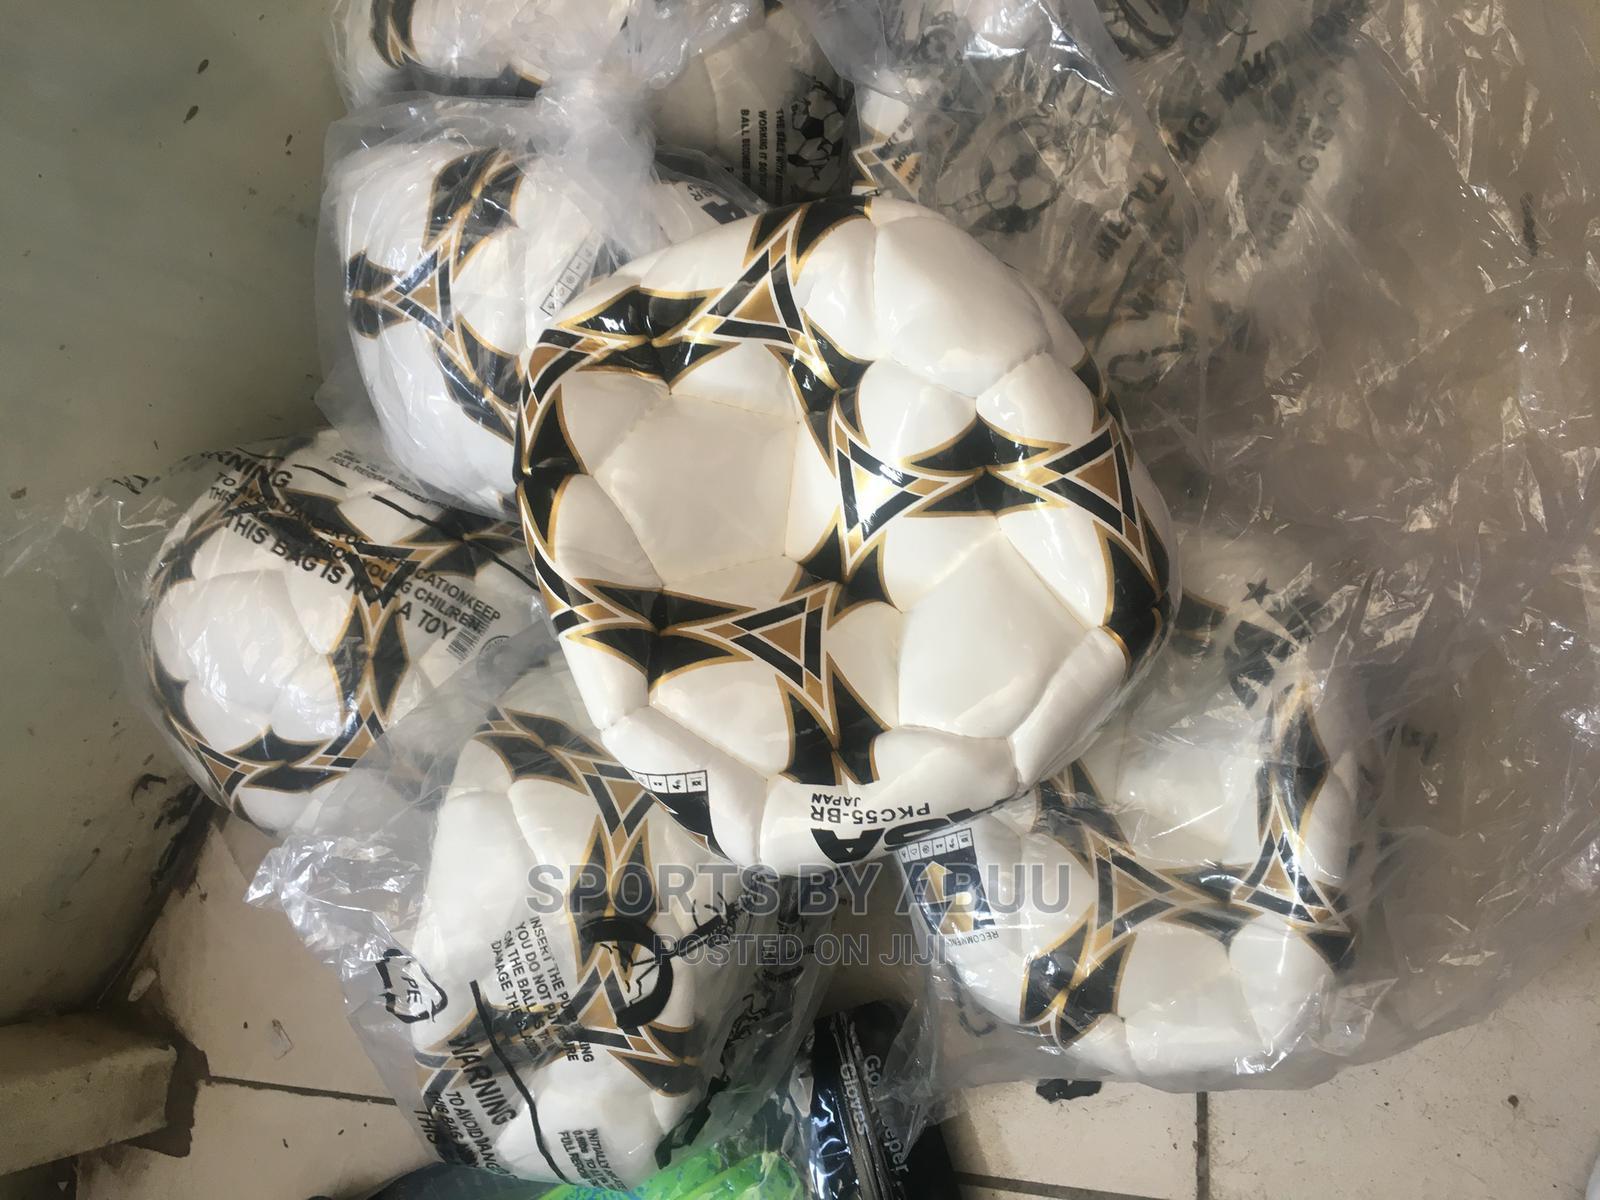 Archive: Mikasa Balls